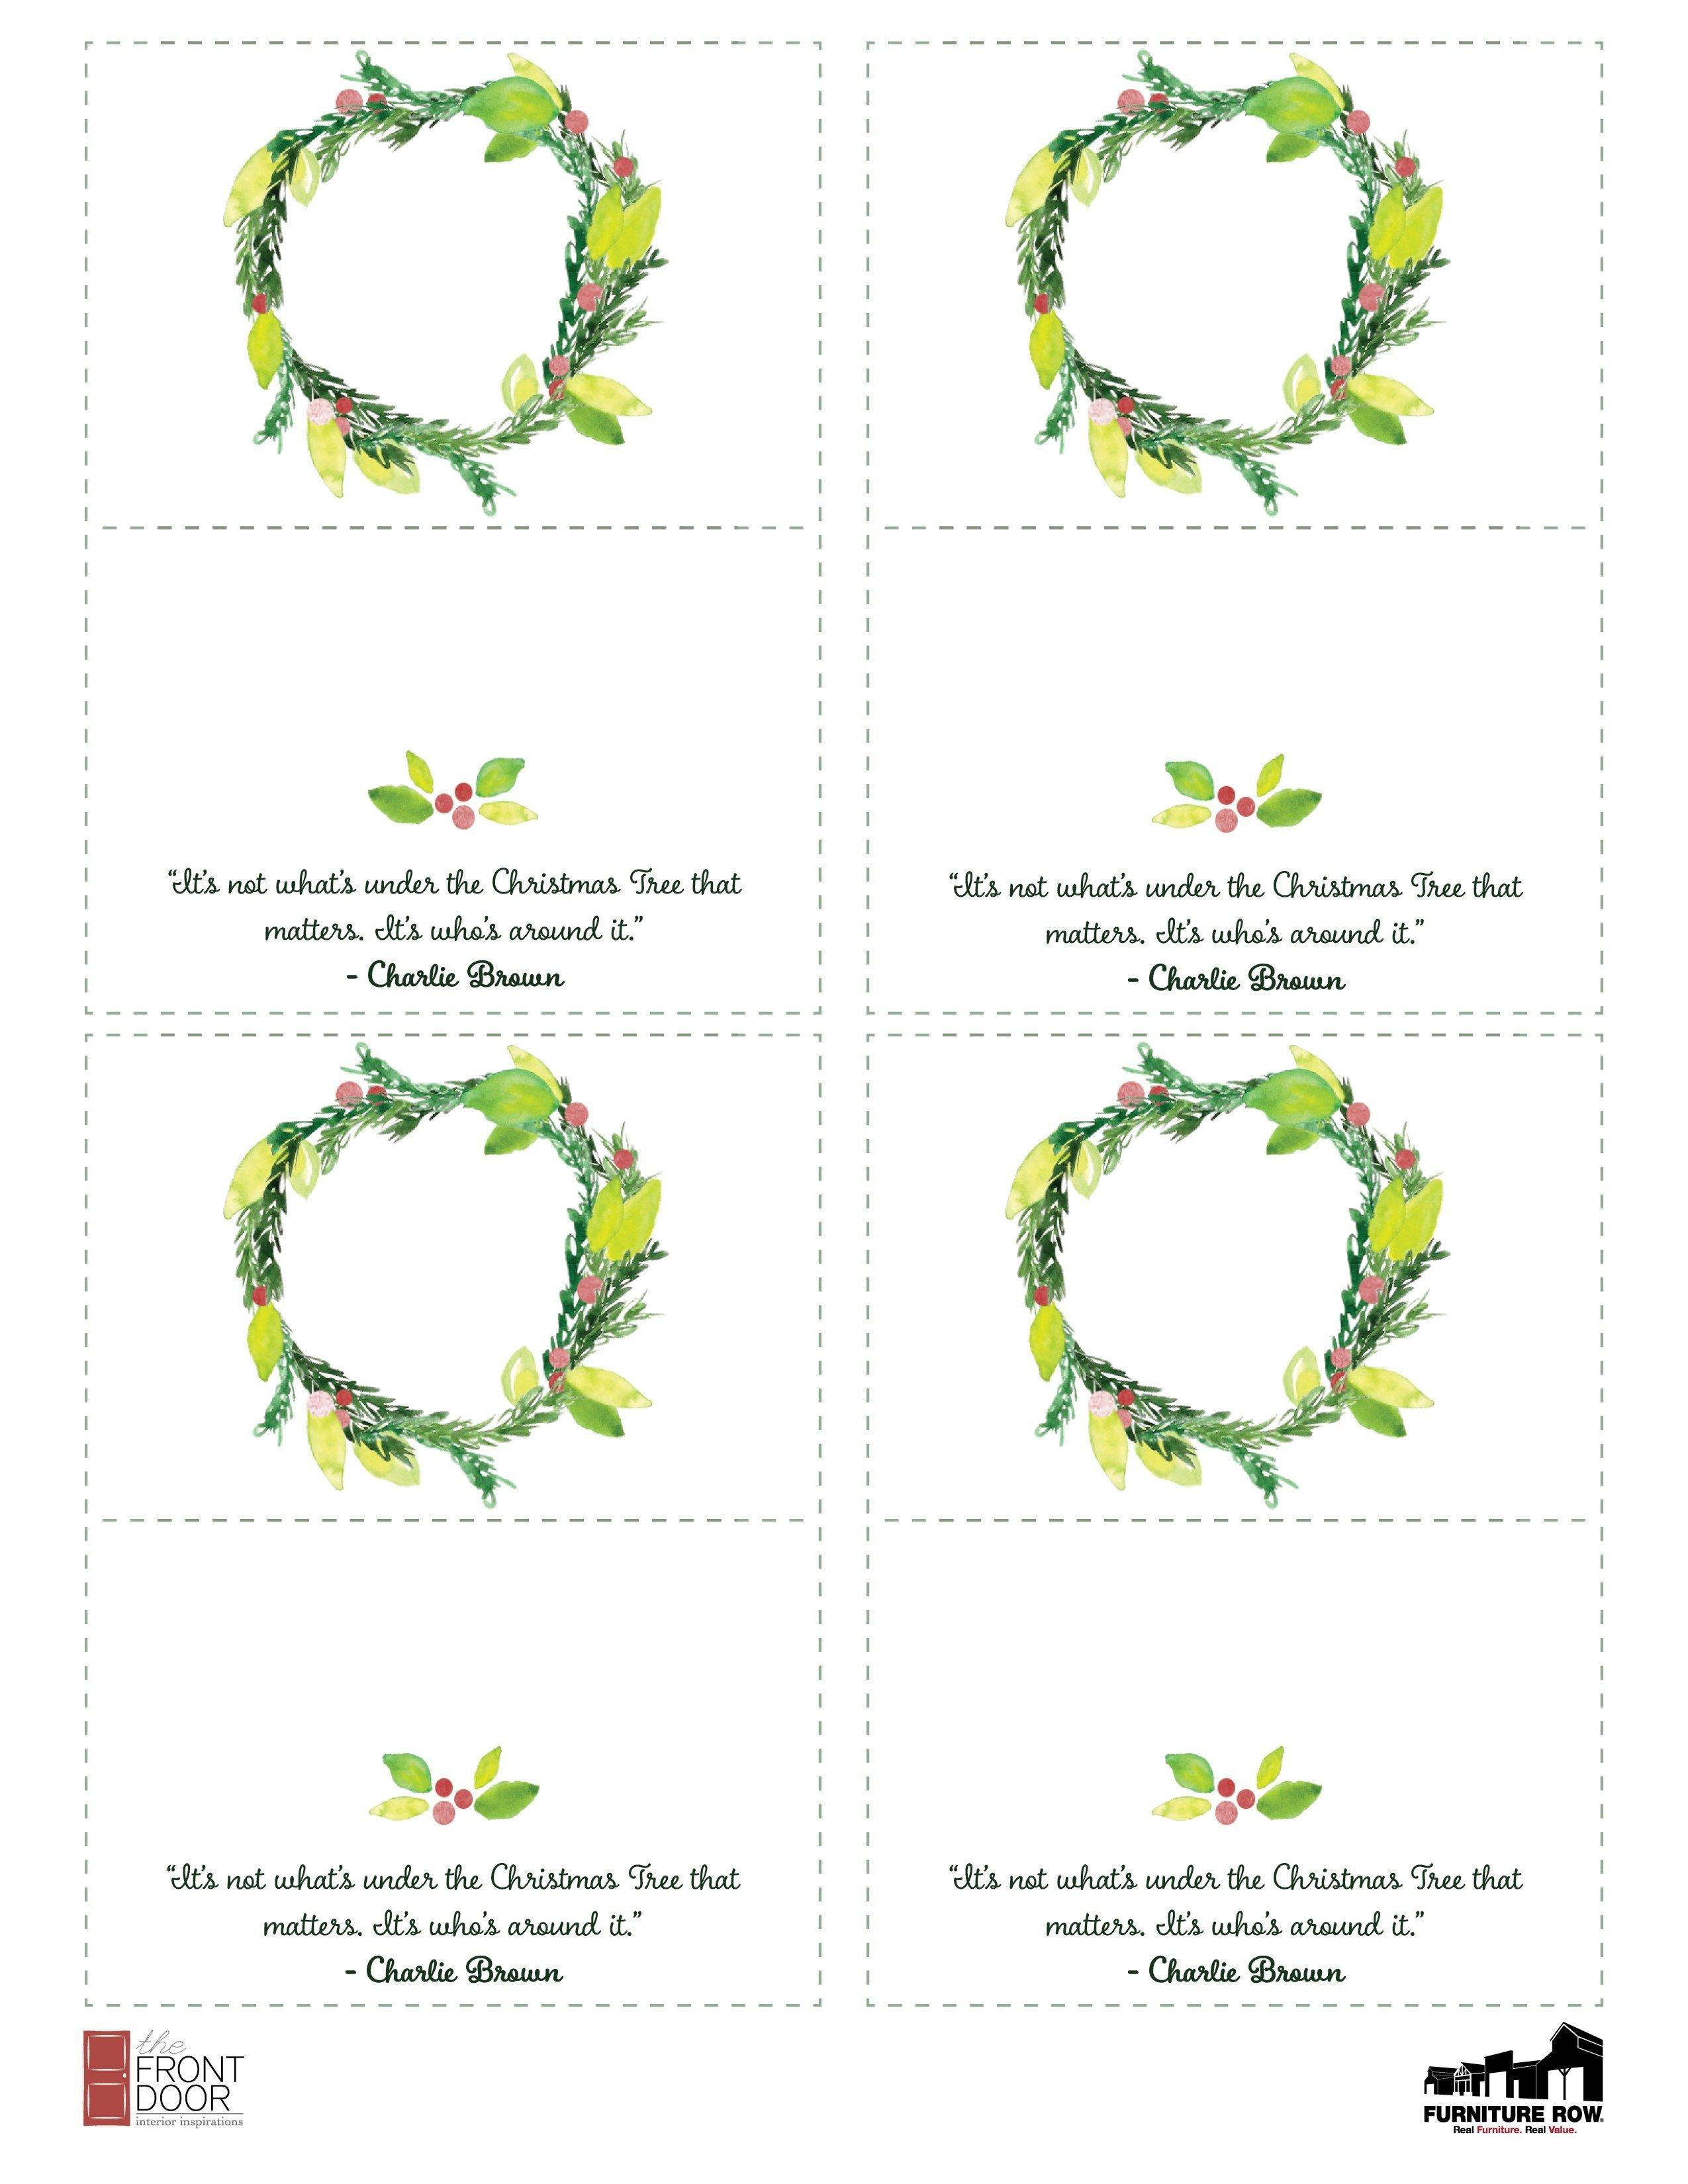 Printable Christmas Place Name Cards For The Table - The Front Door - Free Printable Christmas Place Name Tags